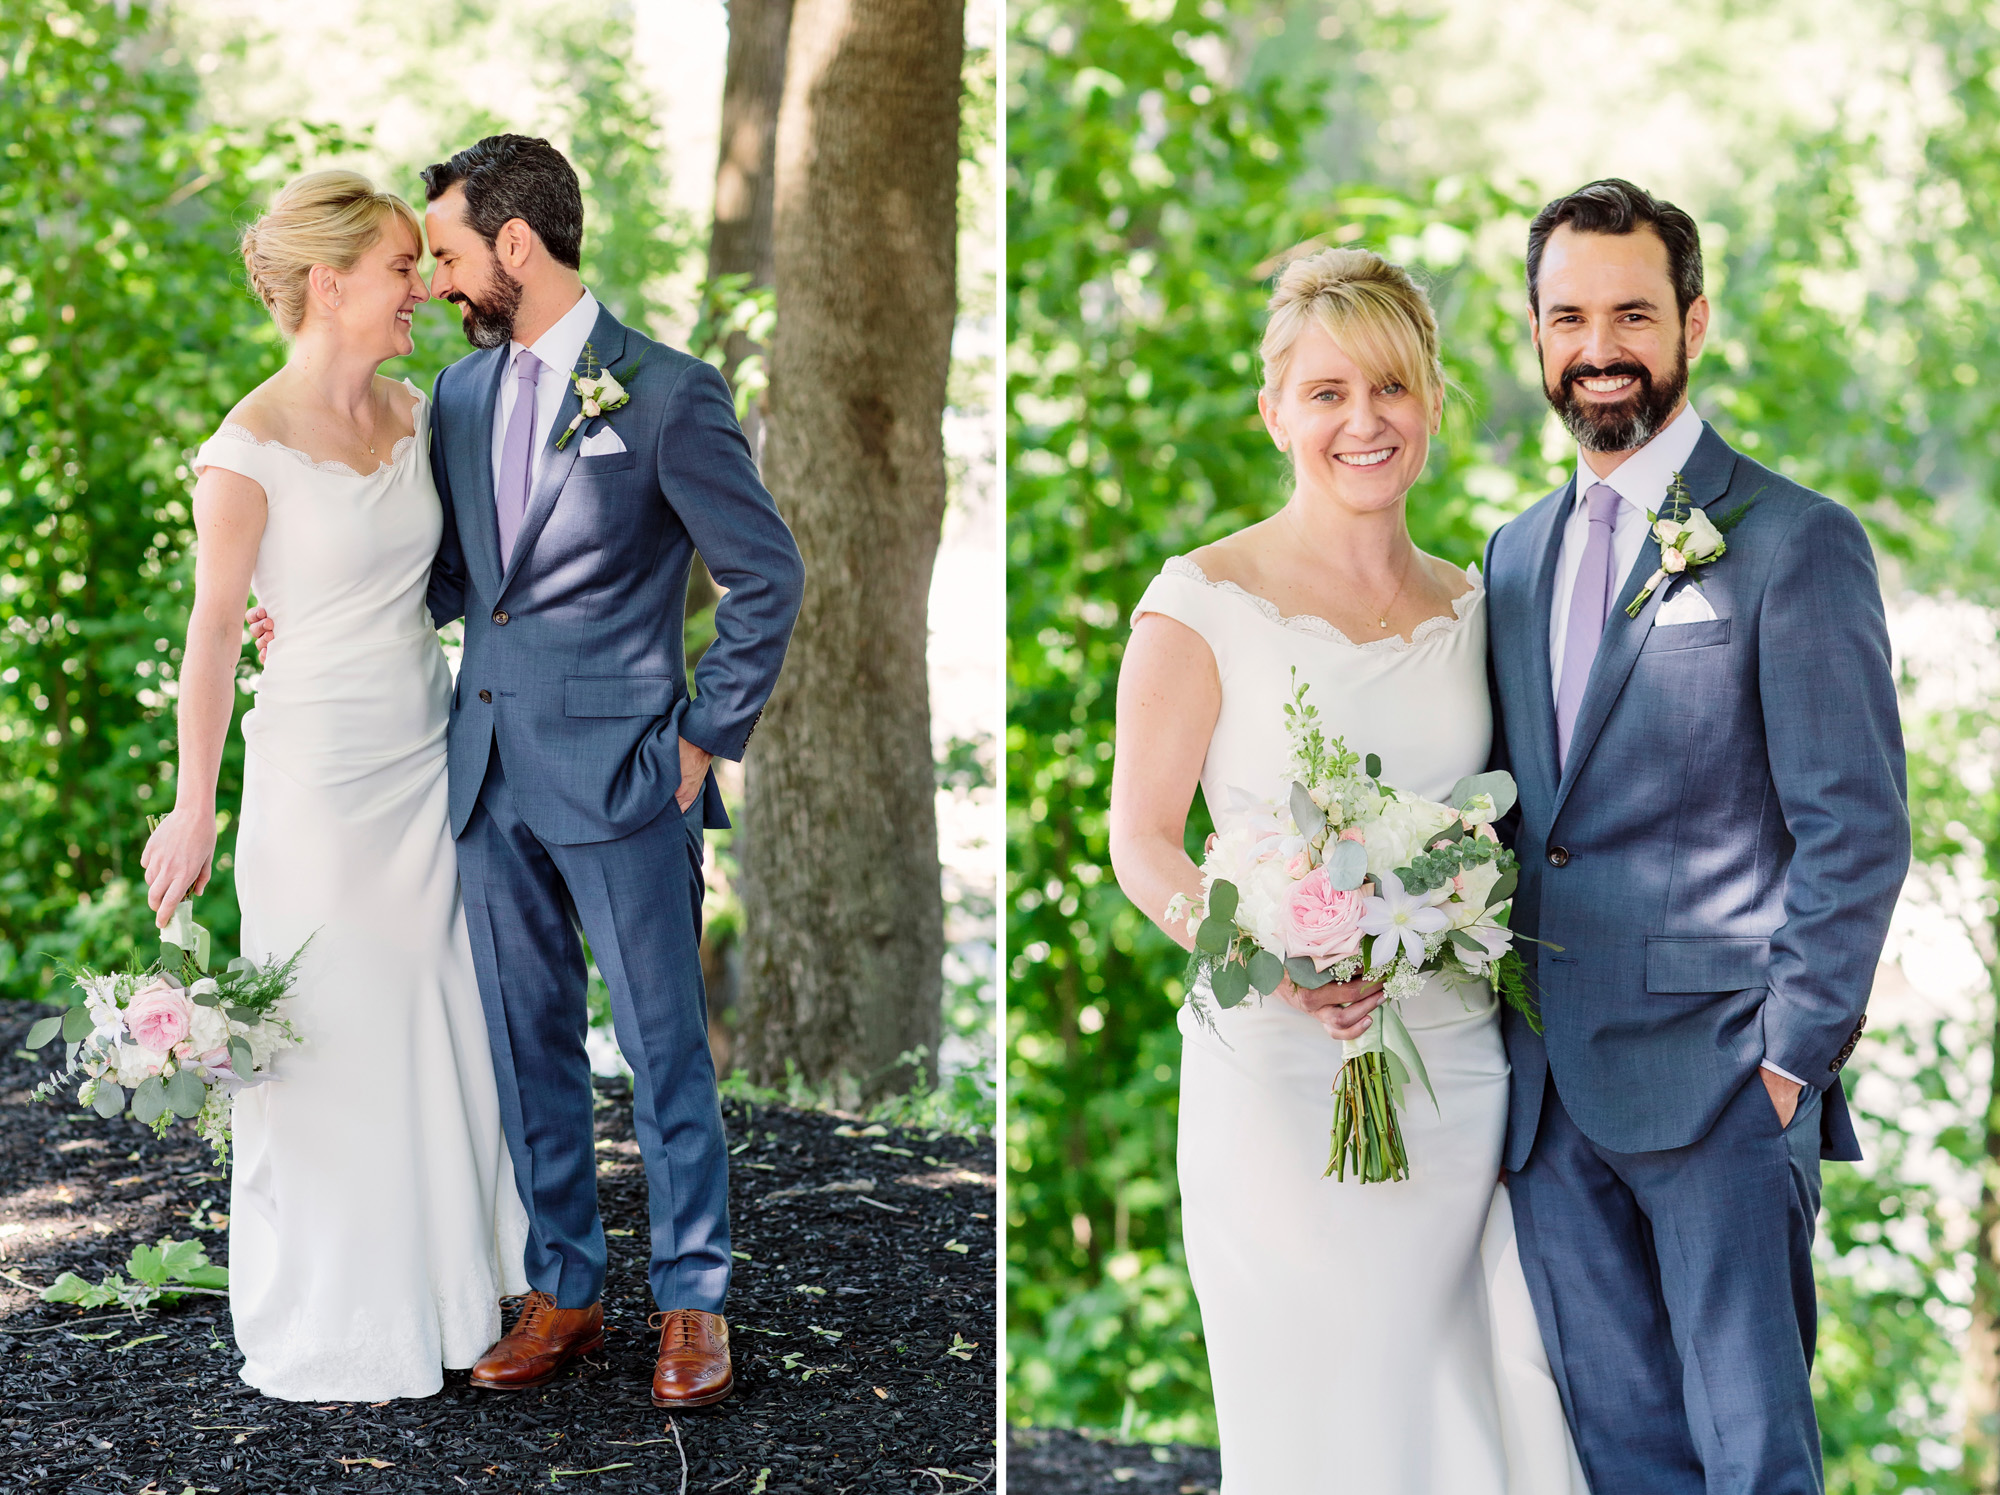 30_Rowan_Brian_The_Roundhouse_Wedding_Beacon_NY_Tanya_Salazar_Photography.jpg